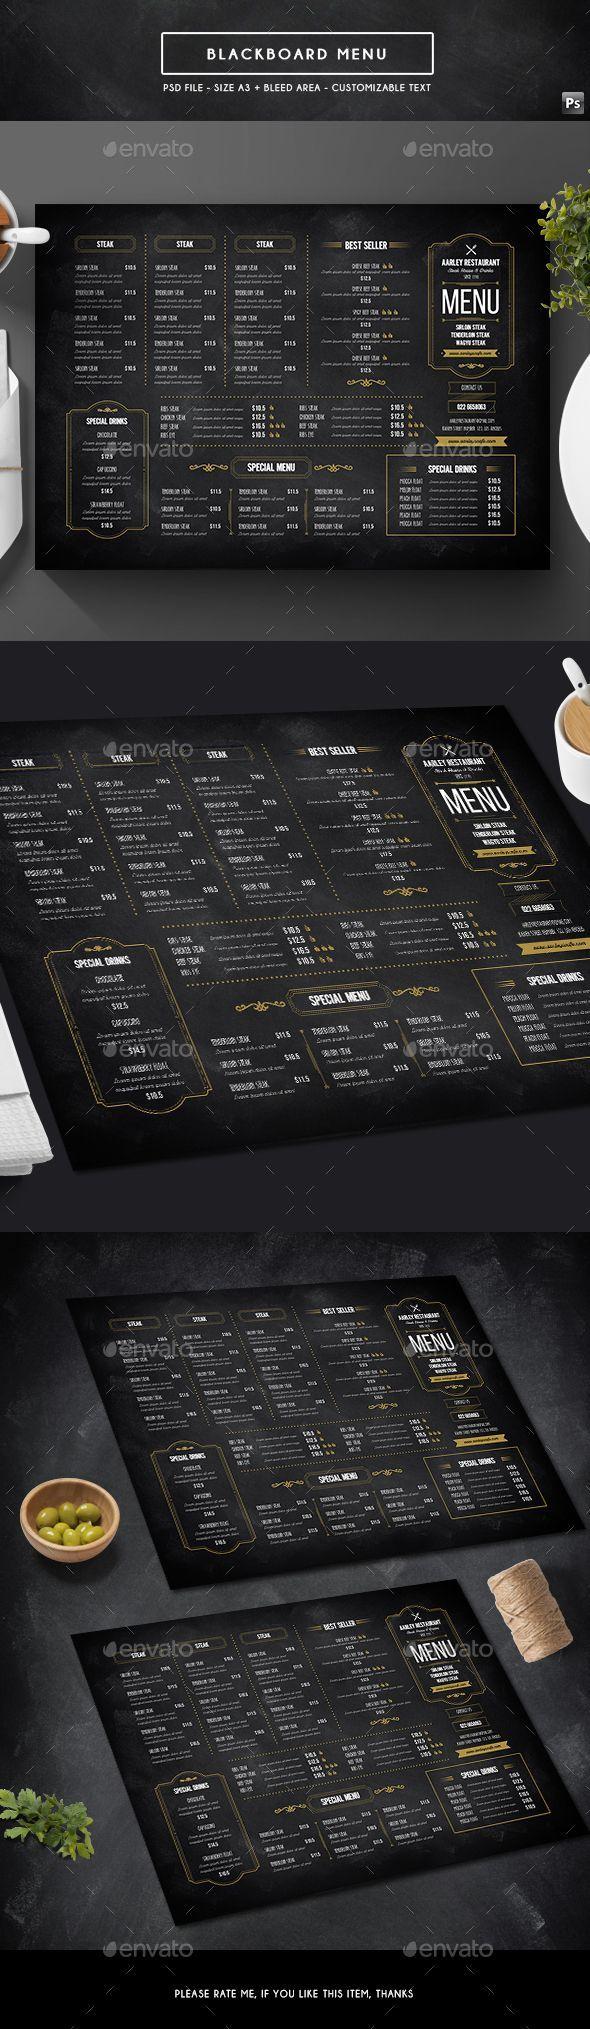 Blackboard Menu — Photoshop PSD #blackboard #elegant • Download ➝ https://graphicriver.net/item/blackboard-menu/19243486?ref=pxcr